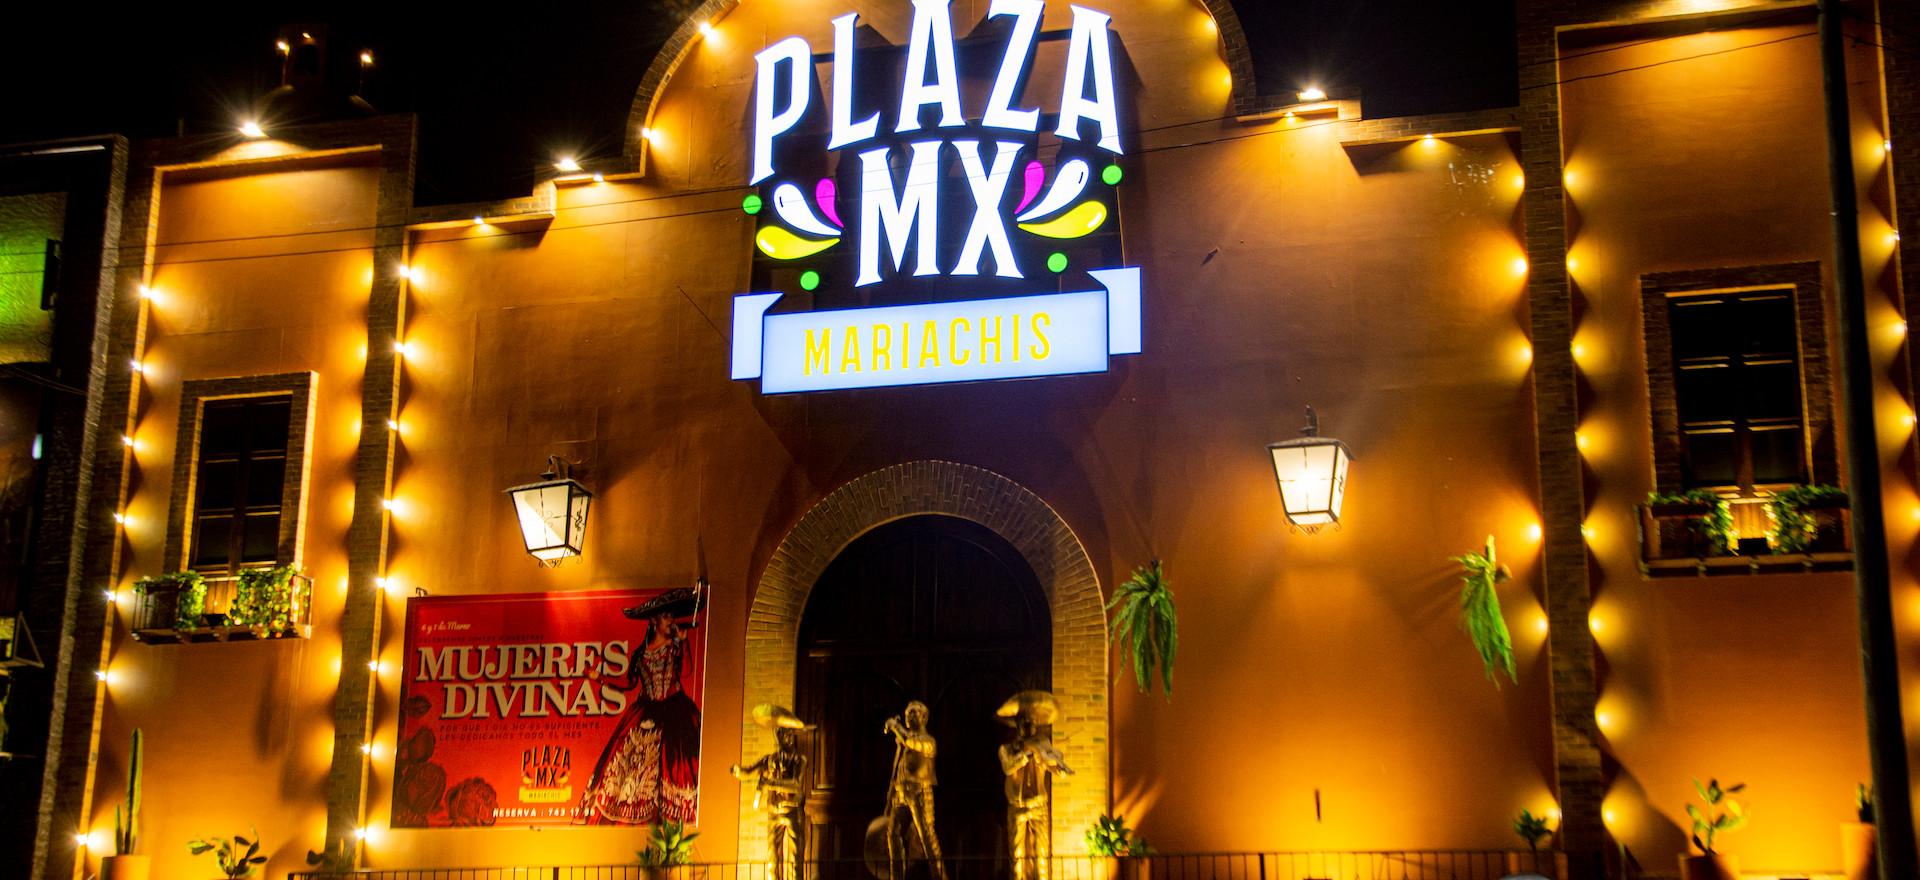 Plaza MX Mariachis